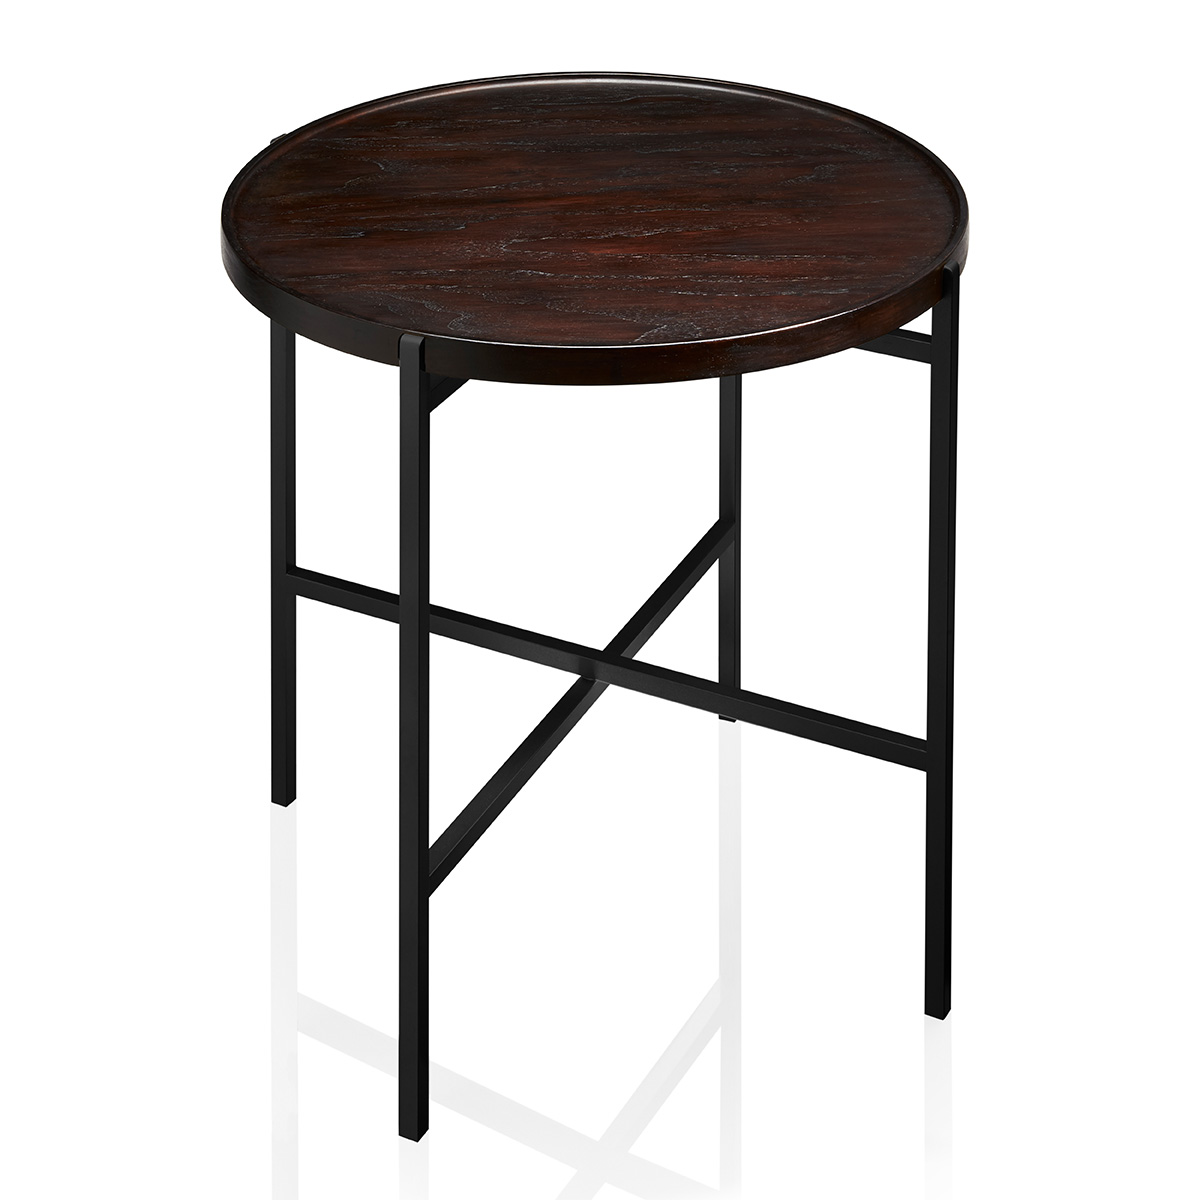 Table_BL_Black-Wood_1.jpg